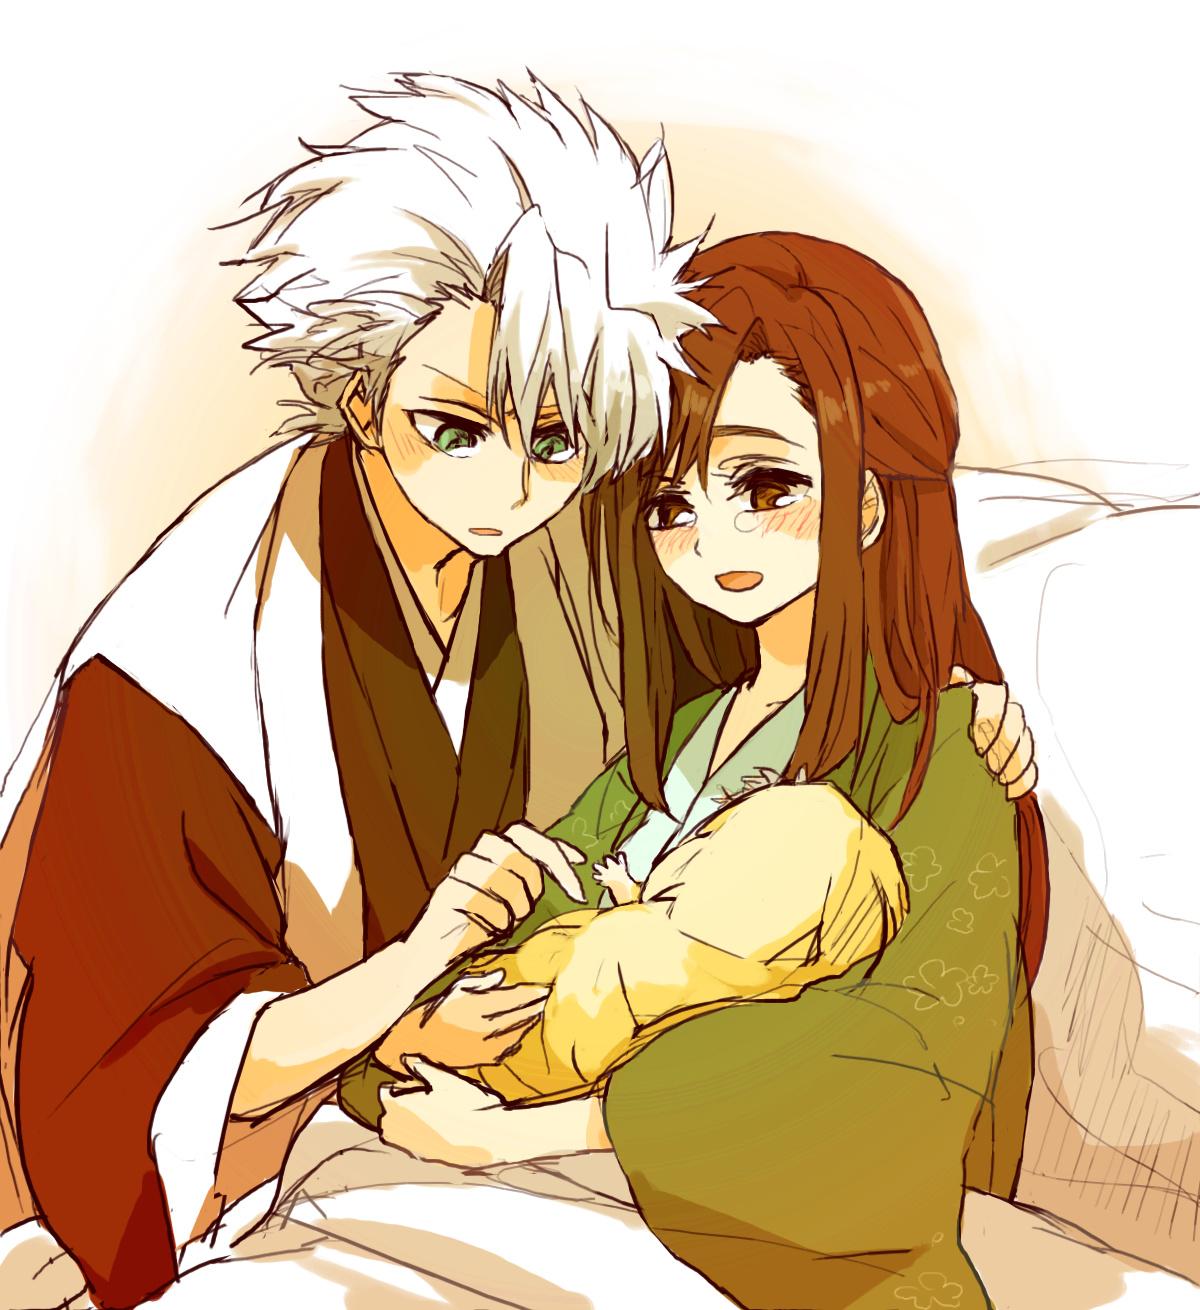 hinamori and toshiro relationship questions